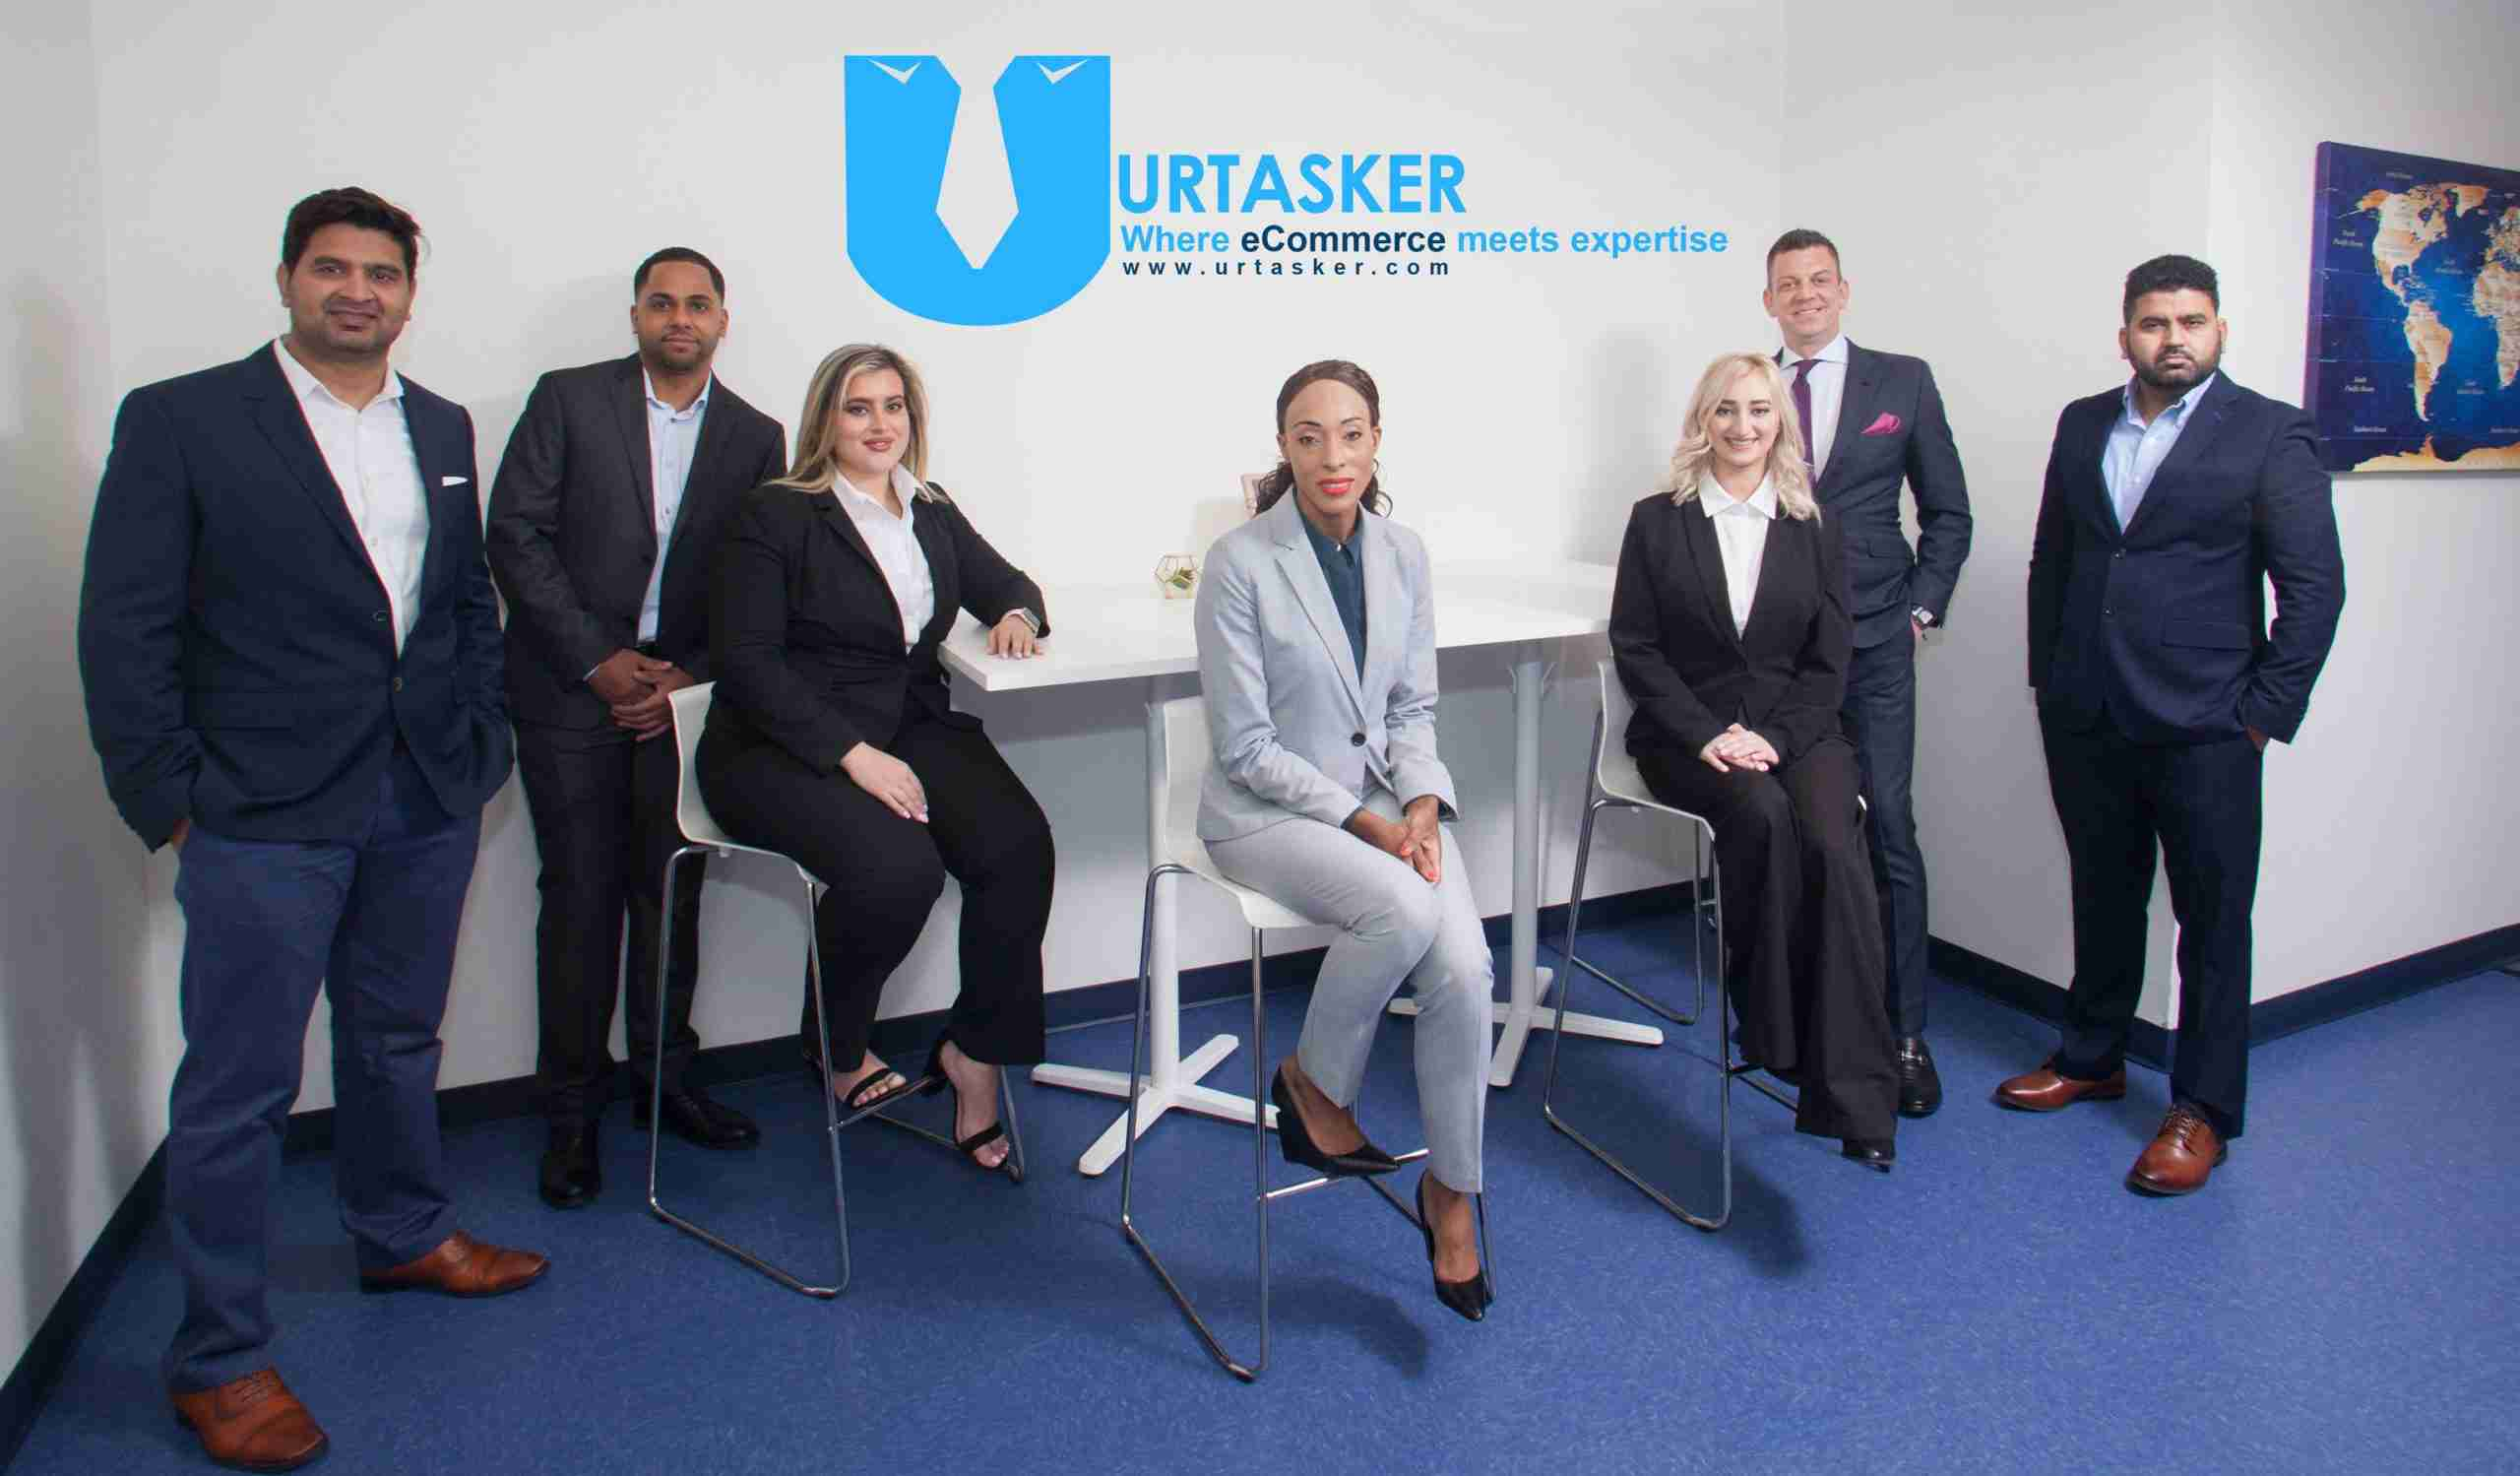 Urtasker Team picture newyork eCommerce company